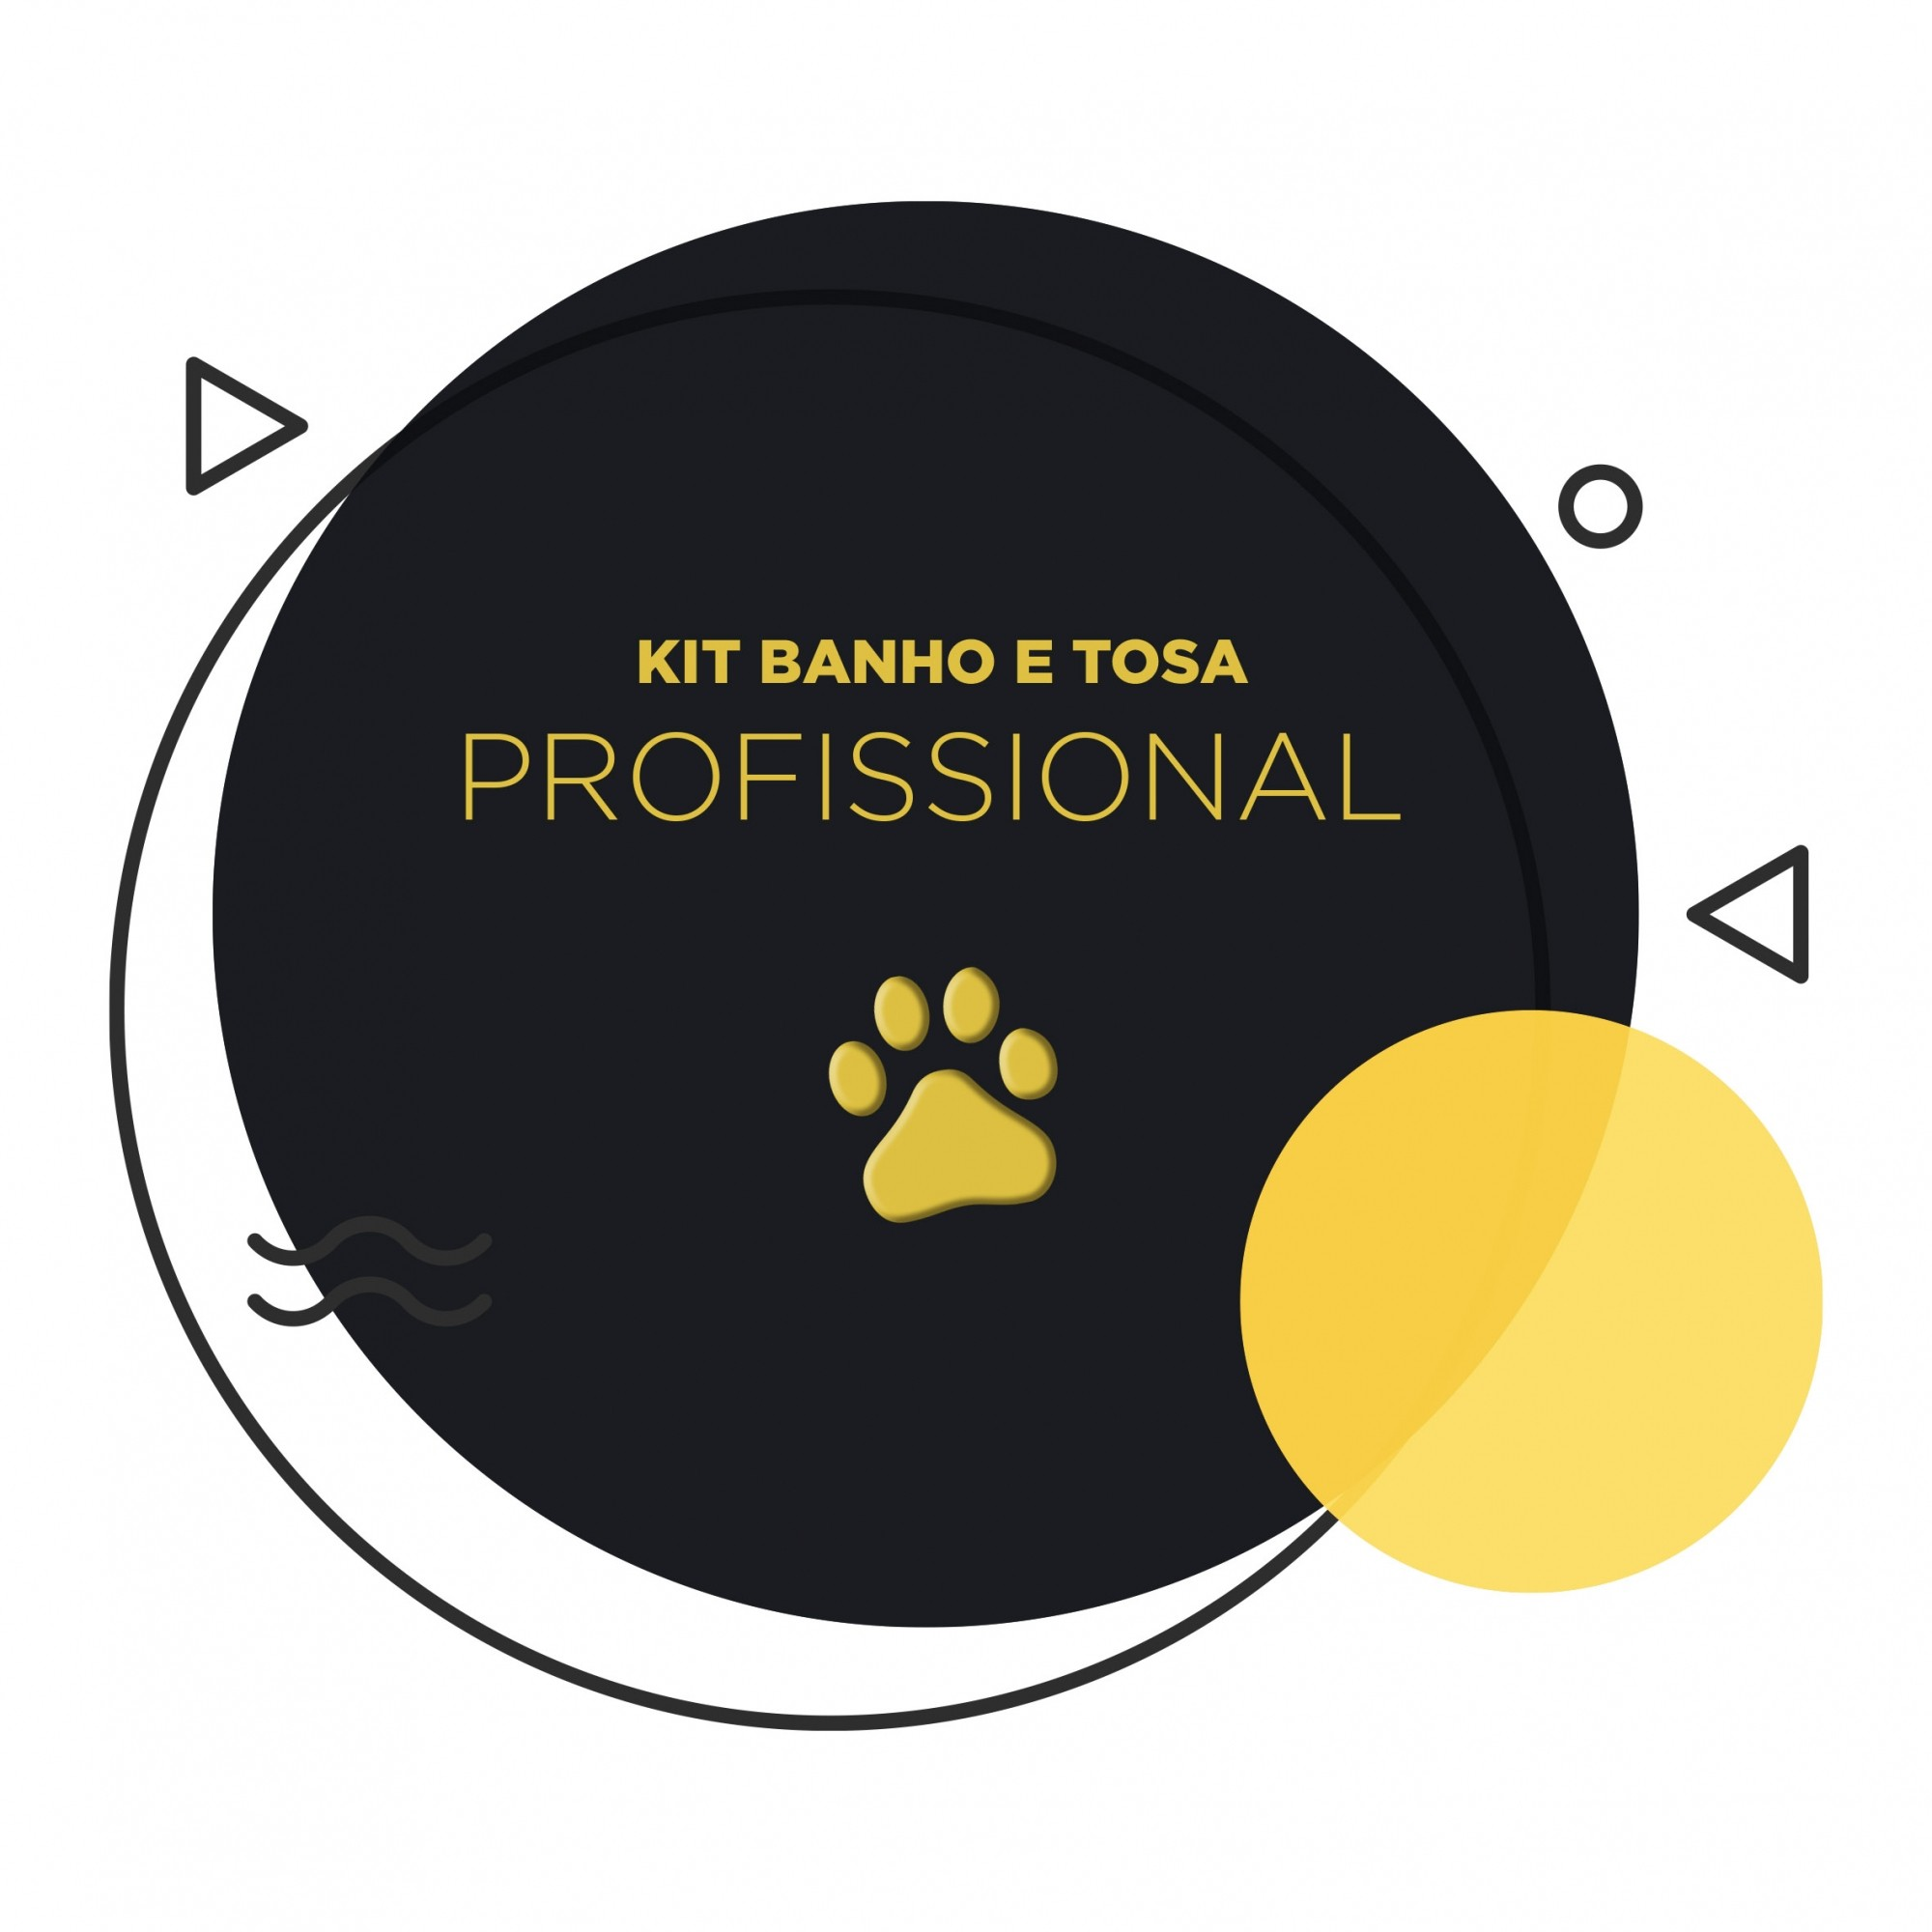 Kit Banho e Tosa - Profissional